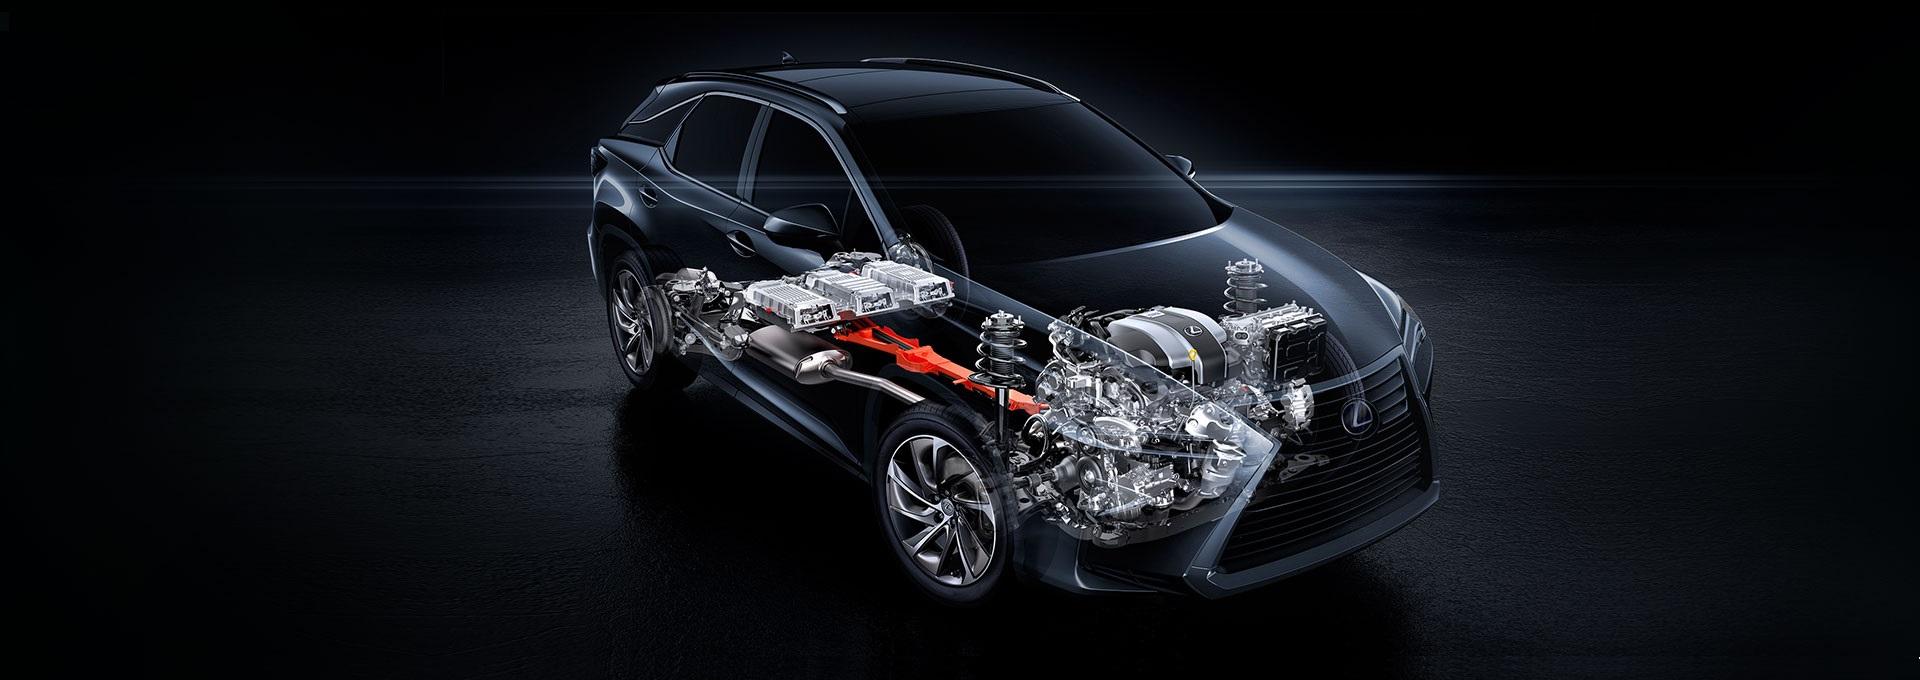 hybrid m5 smartenergy